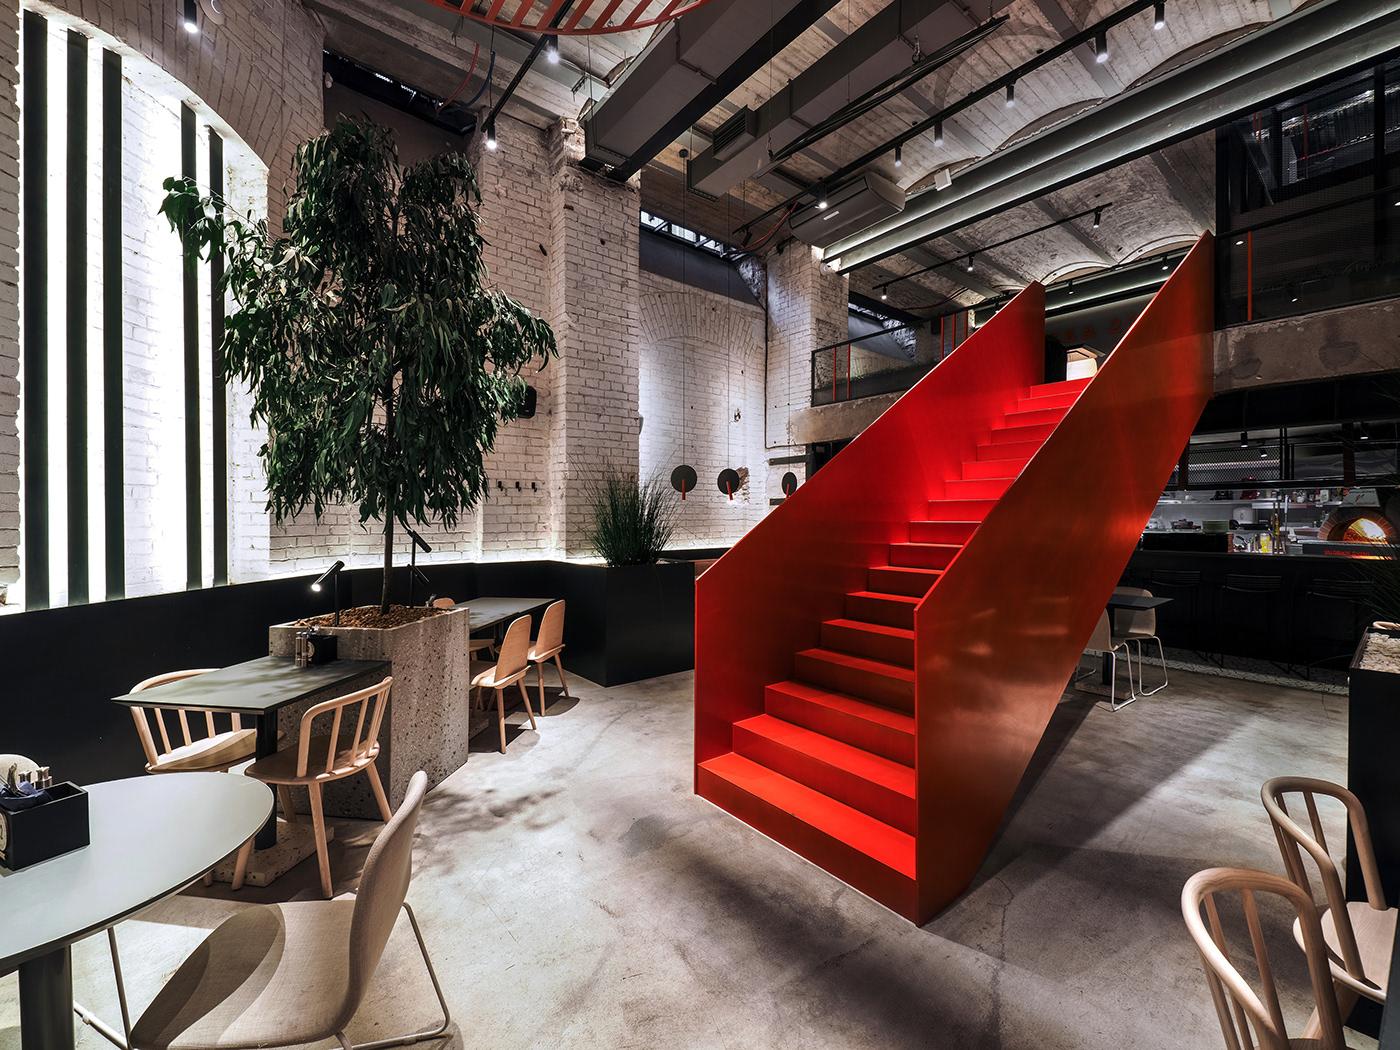 metal concrete modern architecture interior design  red stair Minimalism wood plants